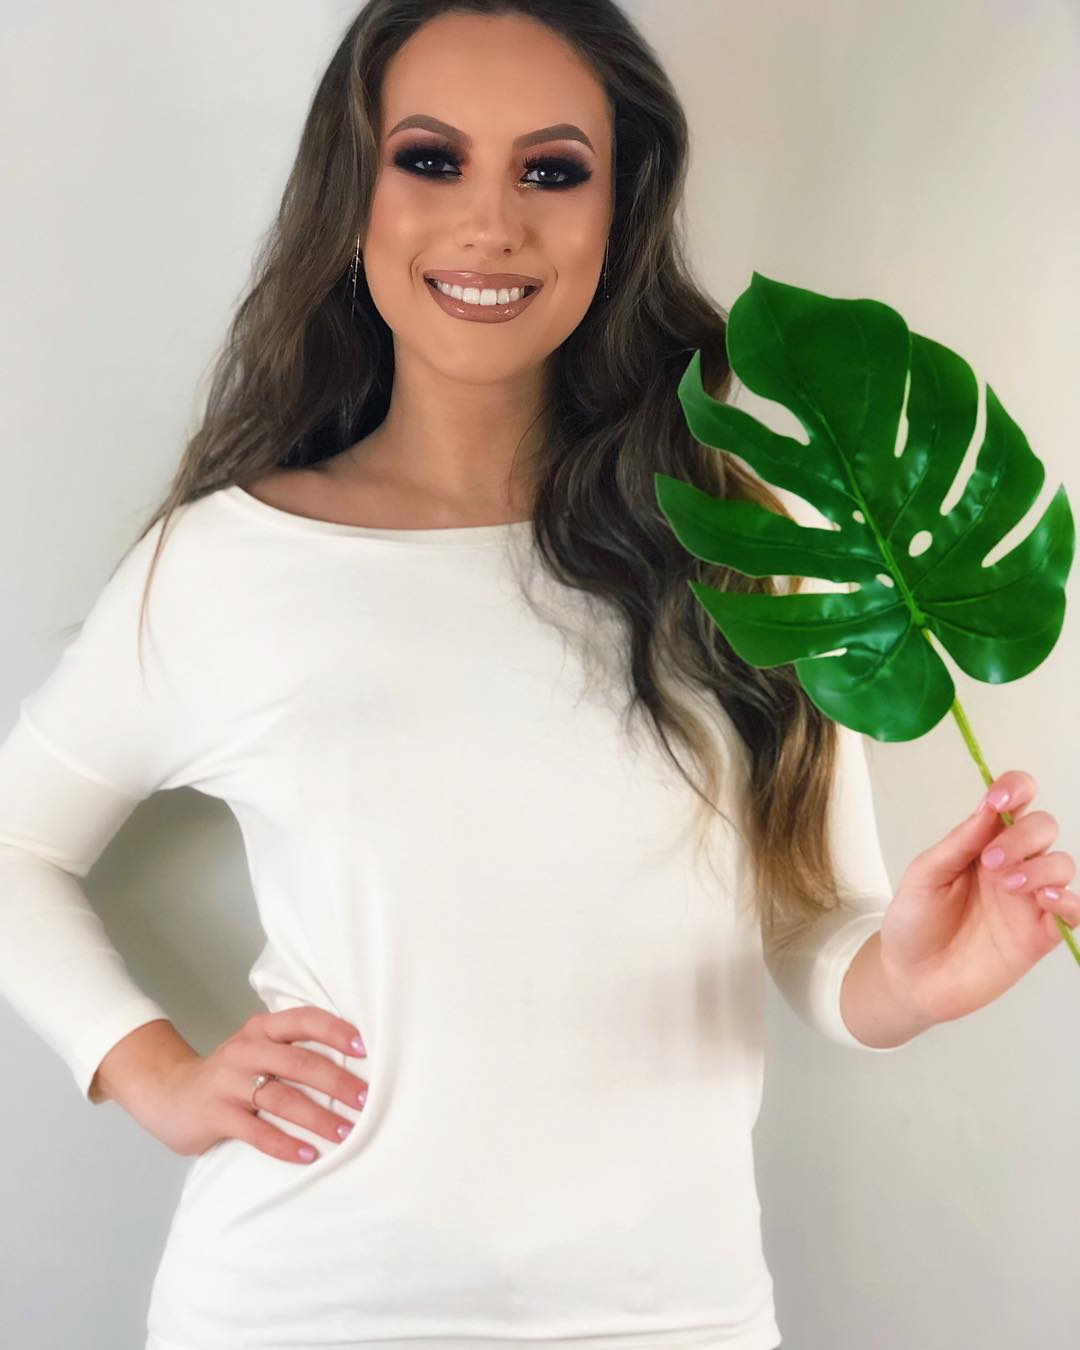 cristine boff sartor, segunda finalista de miss latinoamerica 2019. - Página 4 47079110